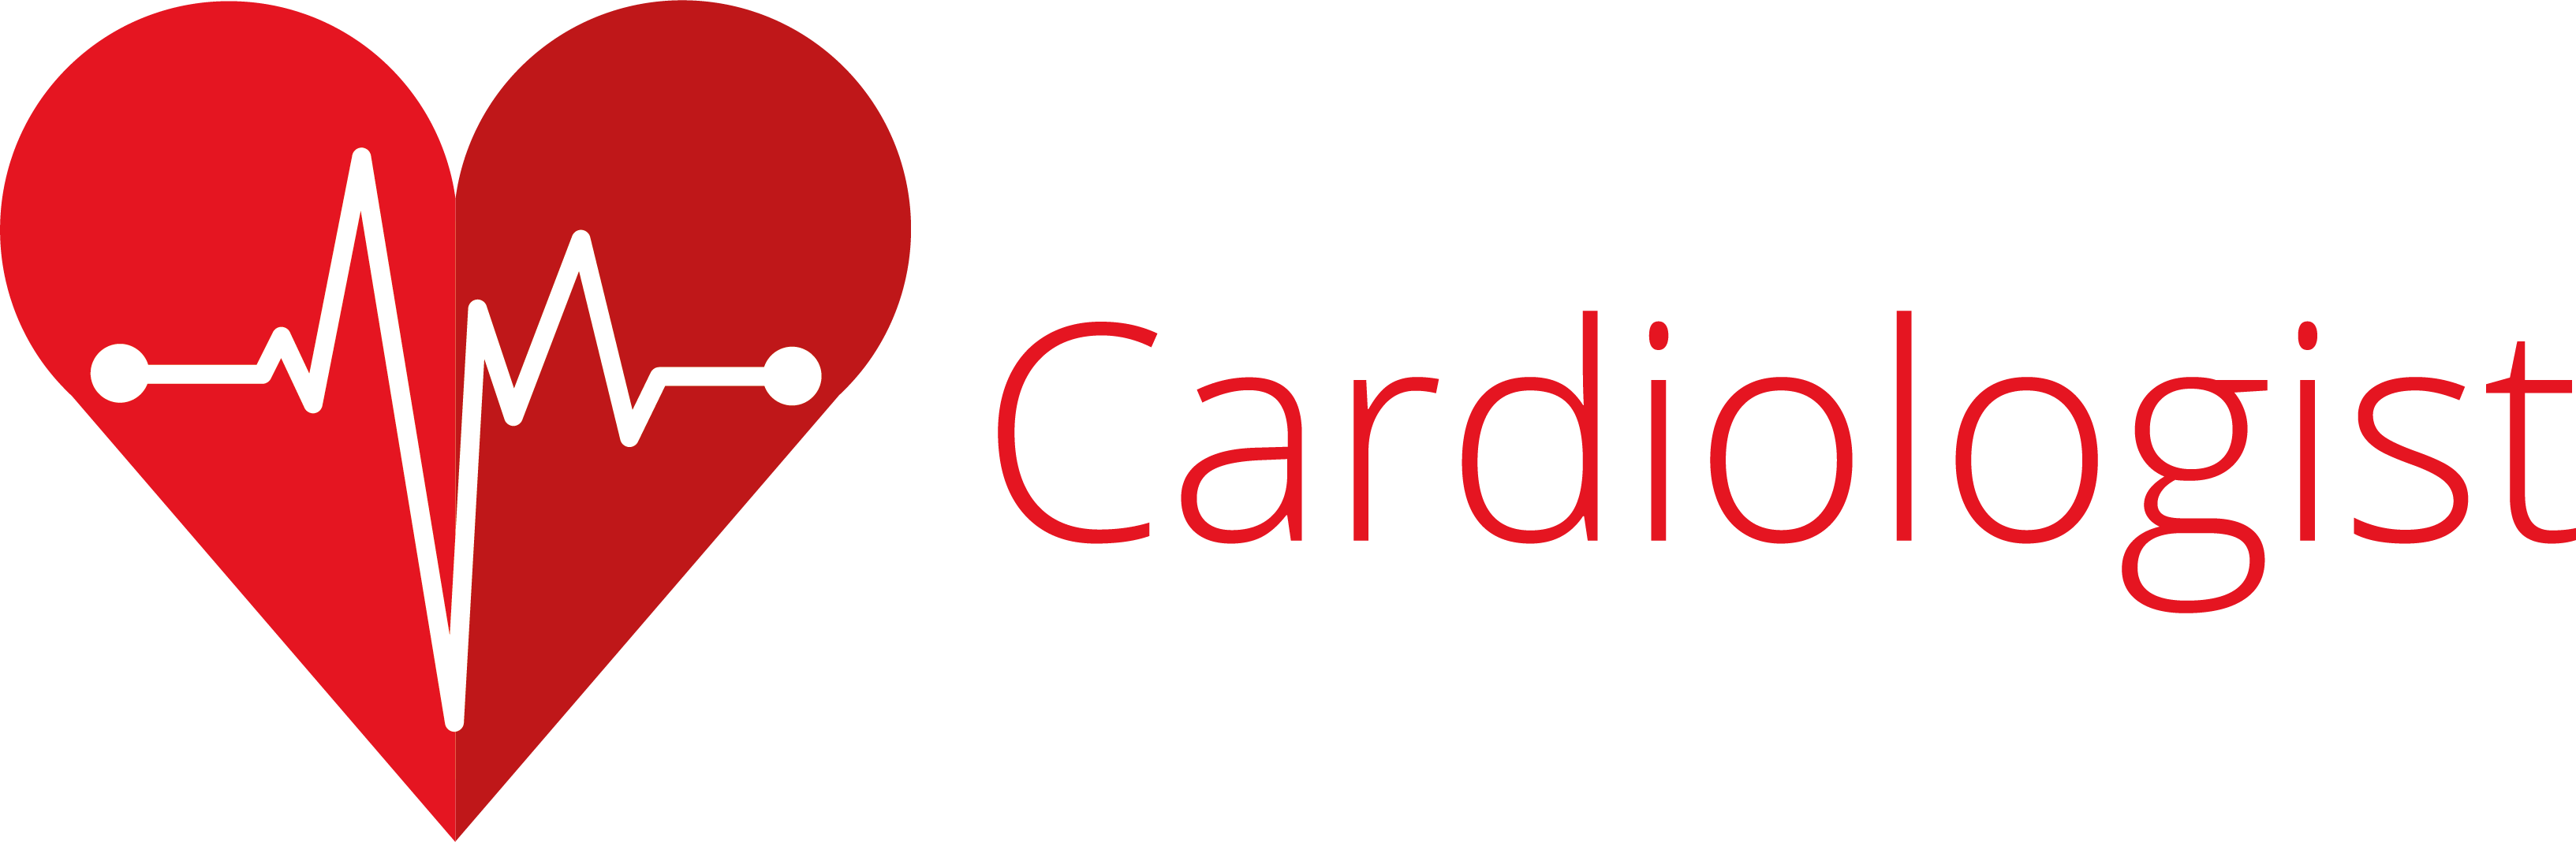 Cornwall Cardiologist